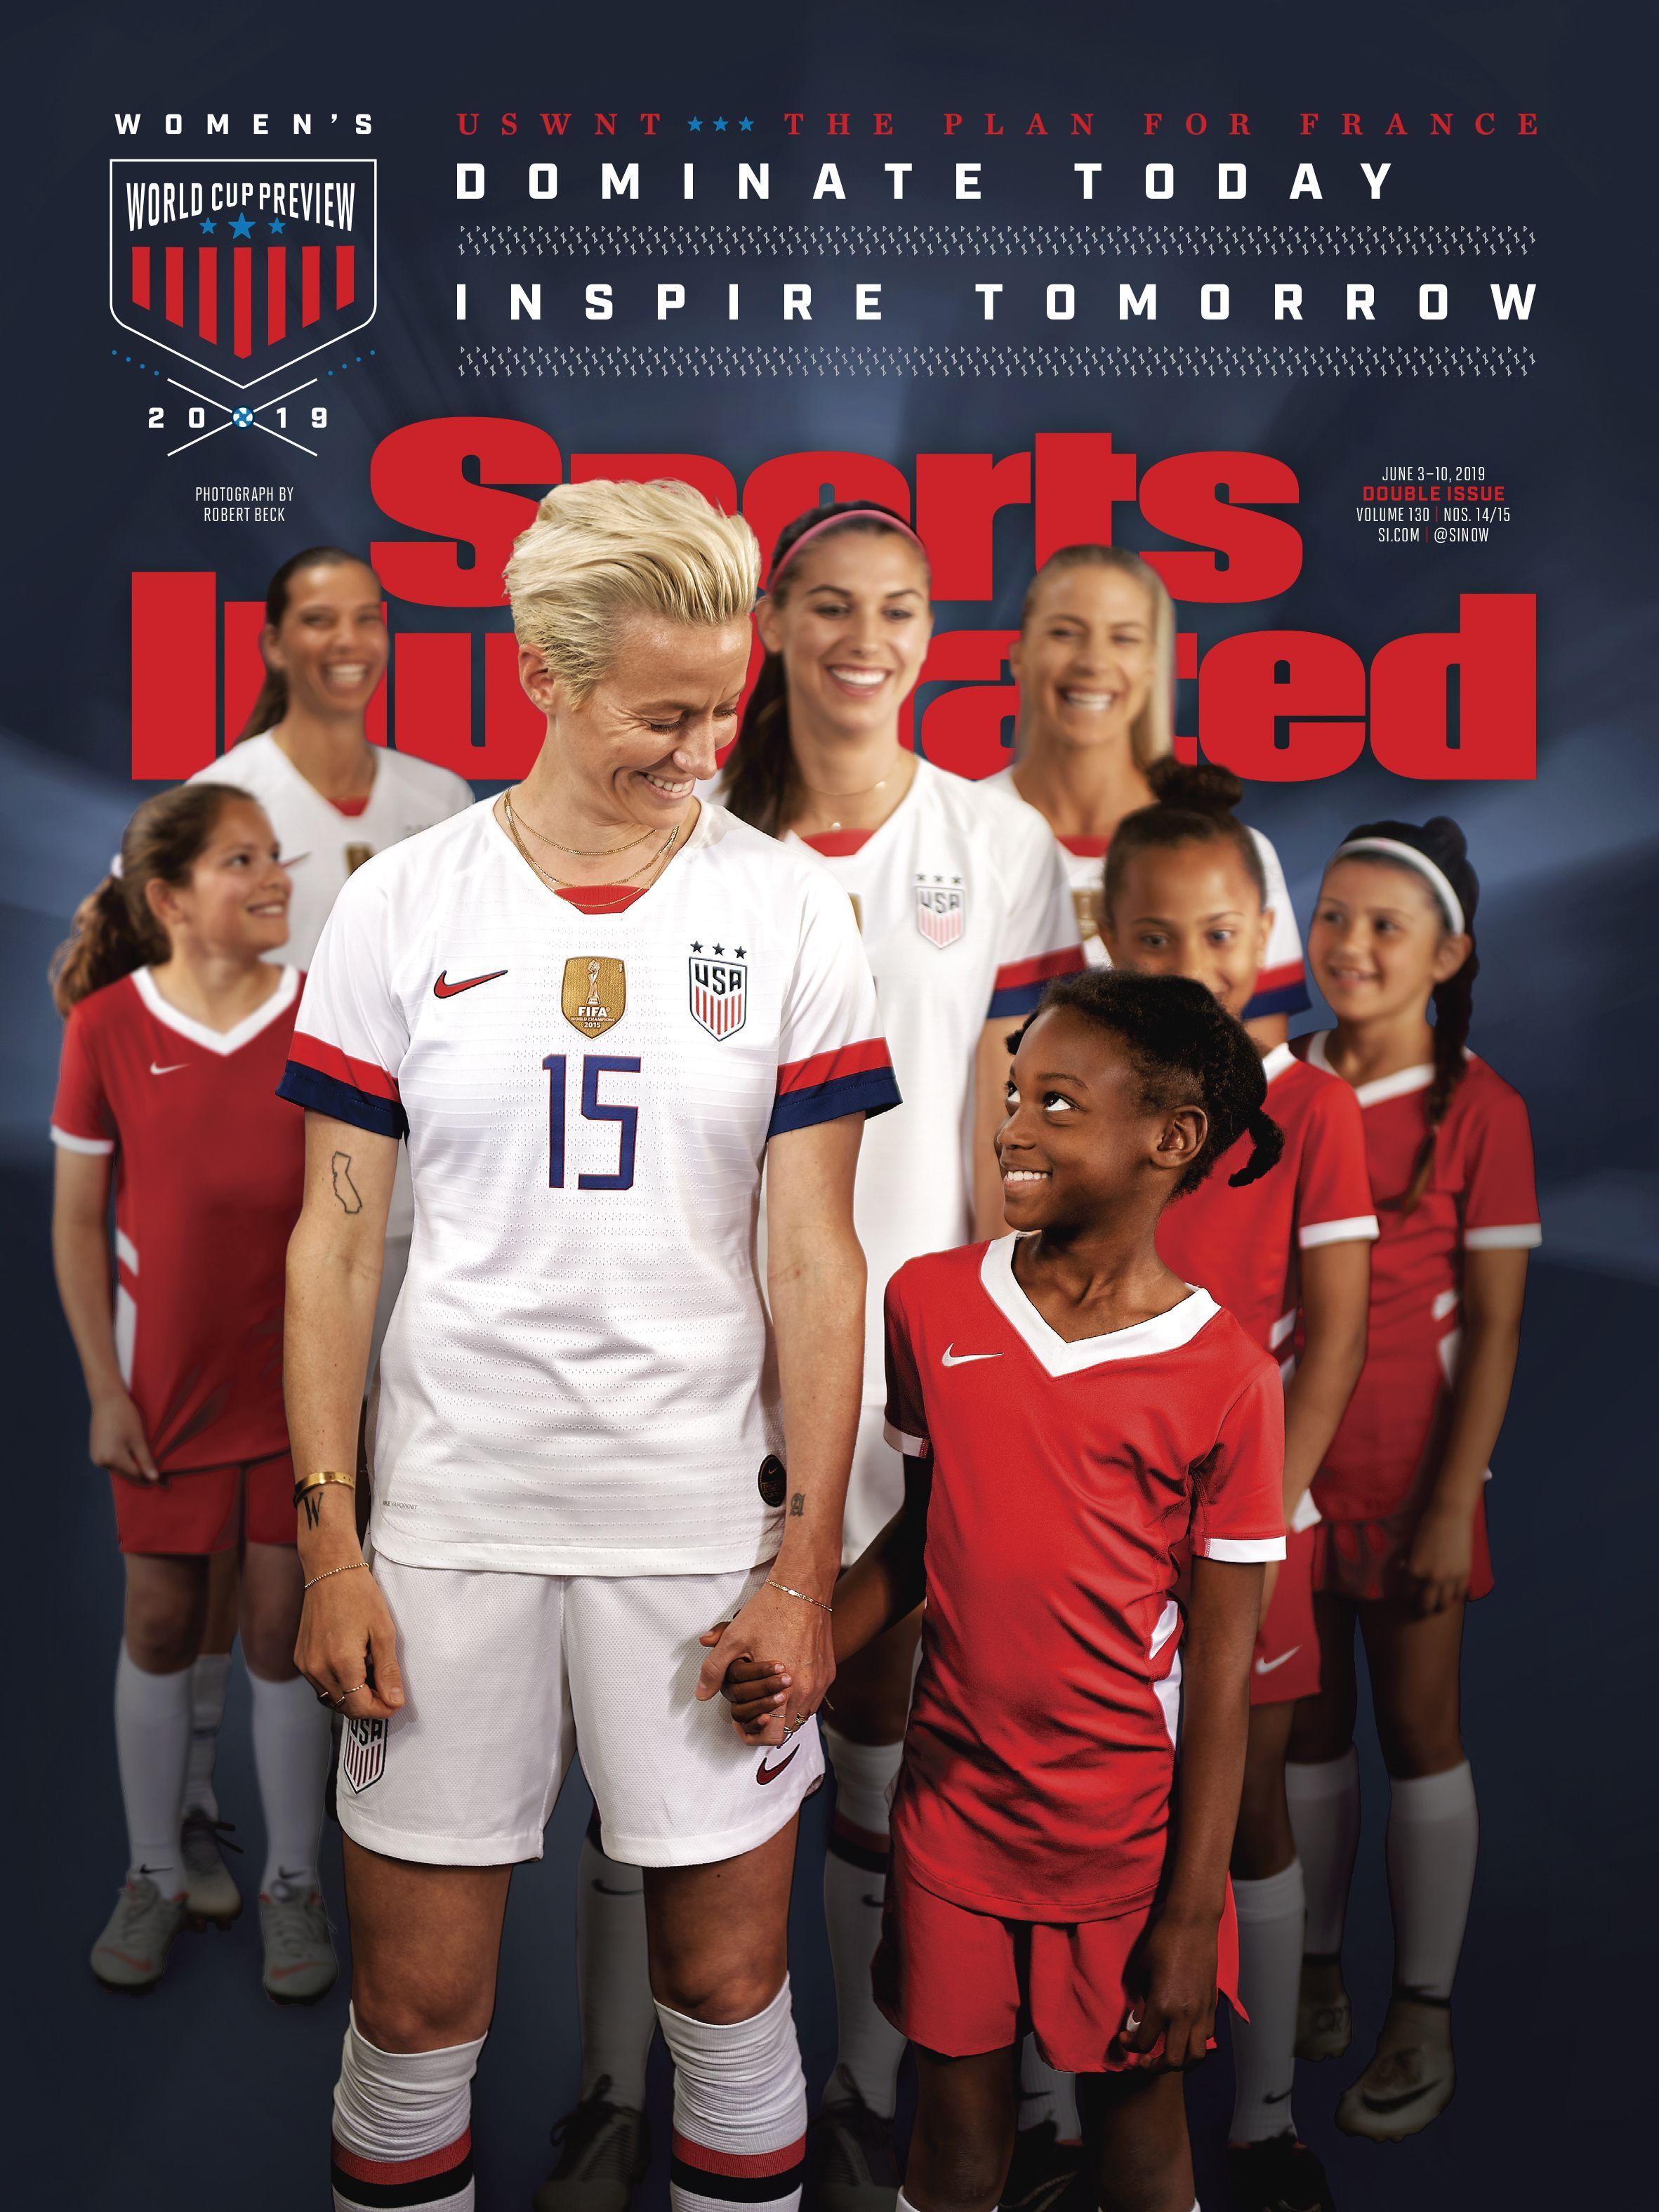 Megan Rapinoe Front Rear L R Tobin Heath Alex Morgan And Julie Ertz Uswnt Sports Illustrated 2019 Women S World Cu Usa Soccer Women Uswnt Megan Rapinoe